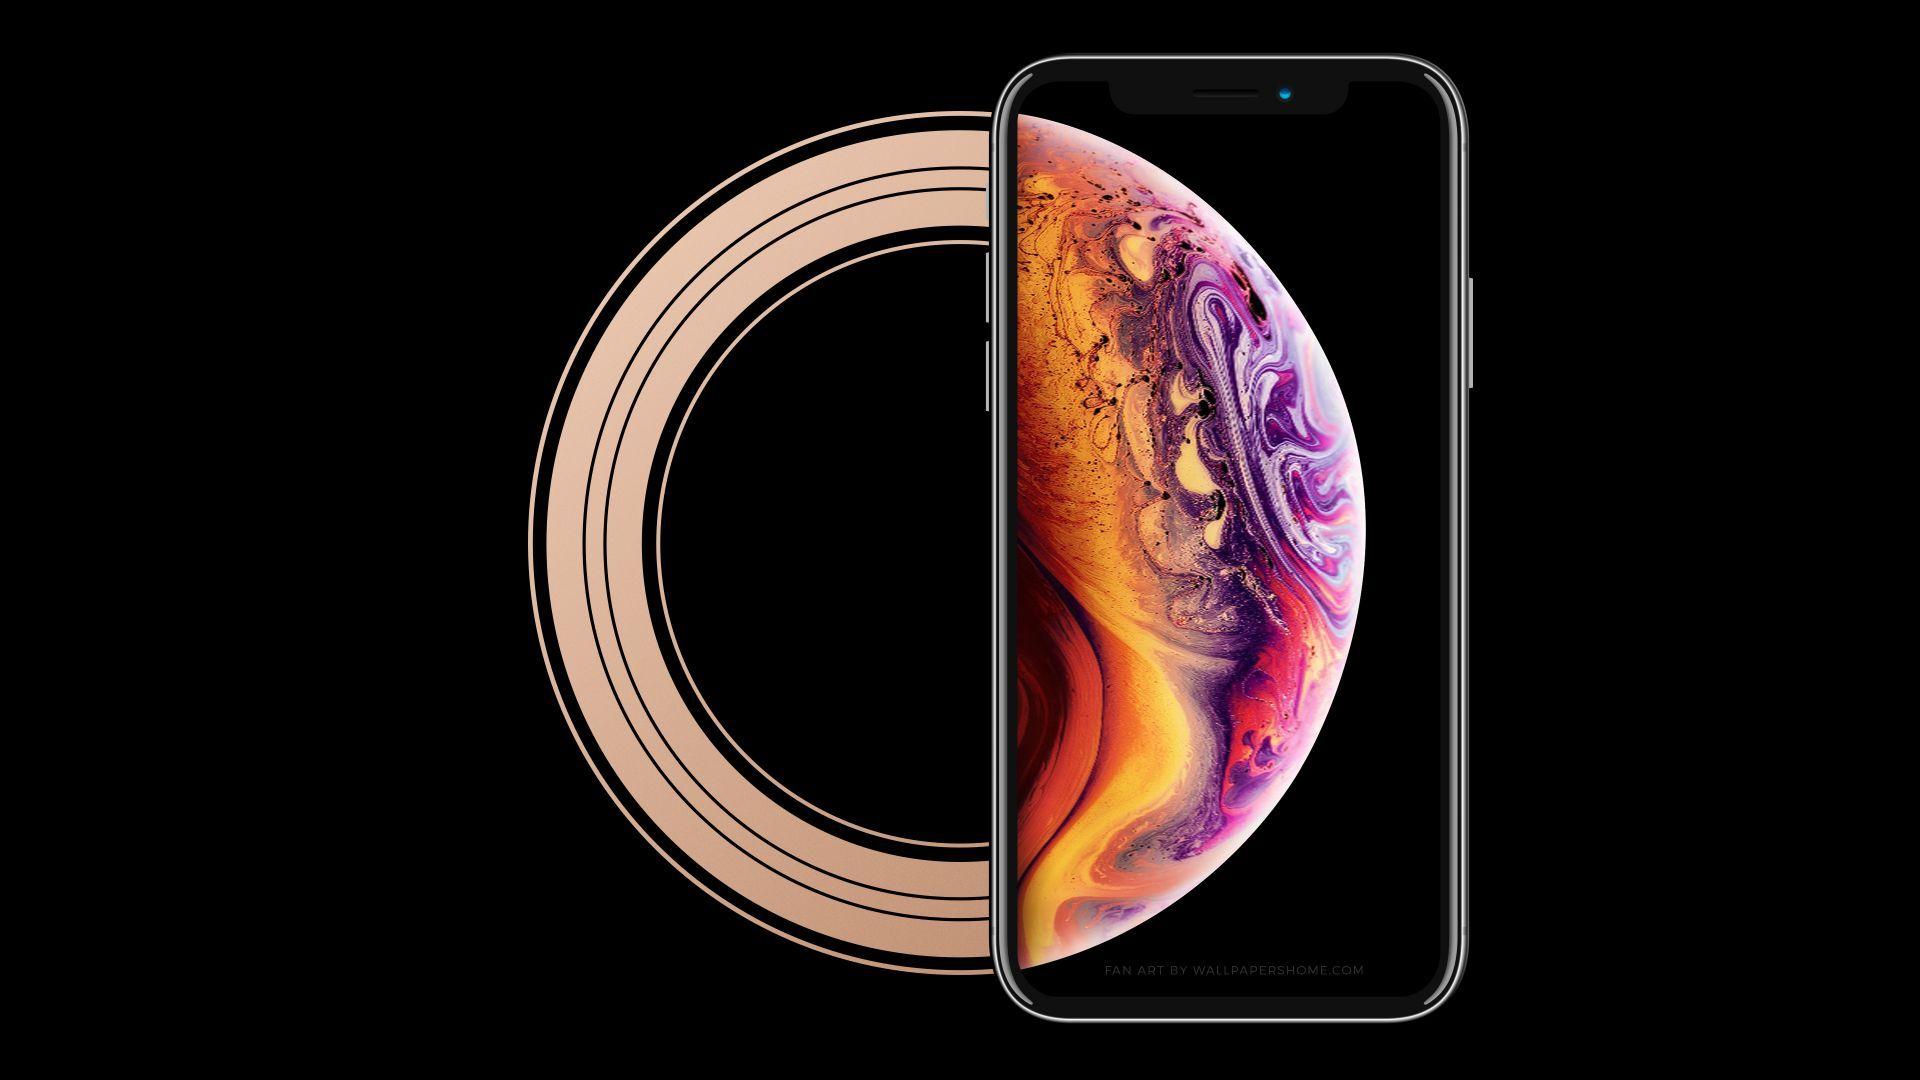 Wallpaper iPhone XS, 4K, OS 20235 (con imágenes) 4k hd